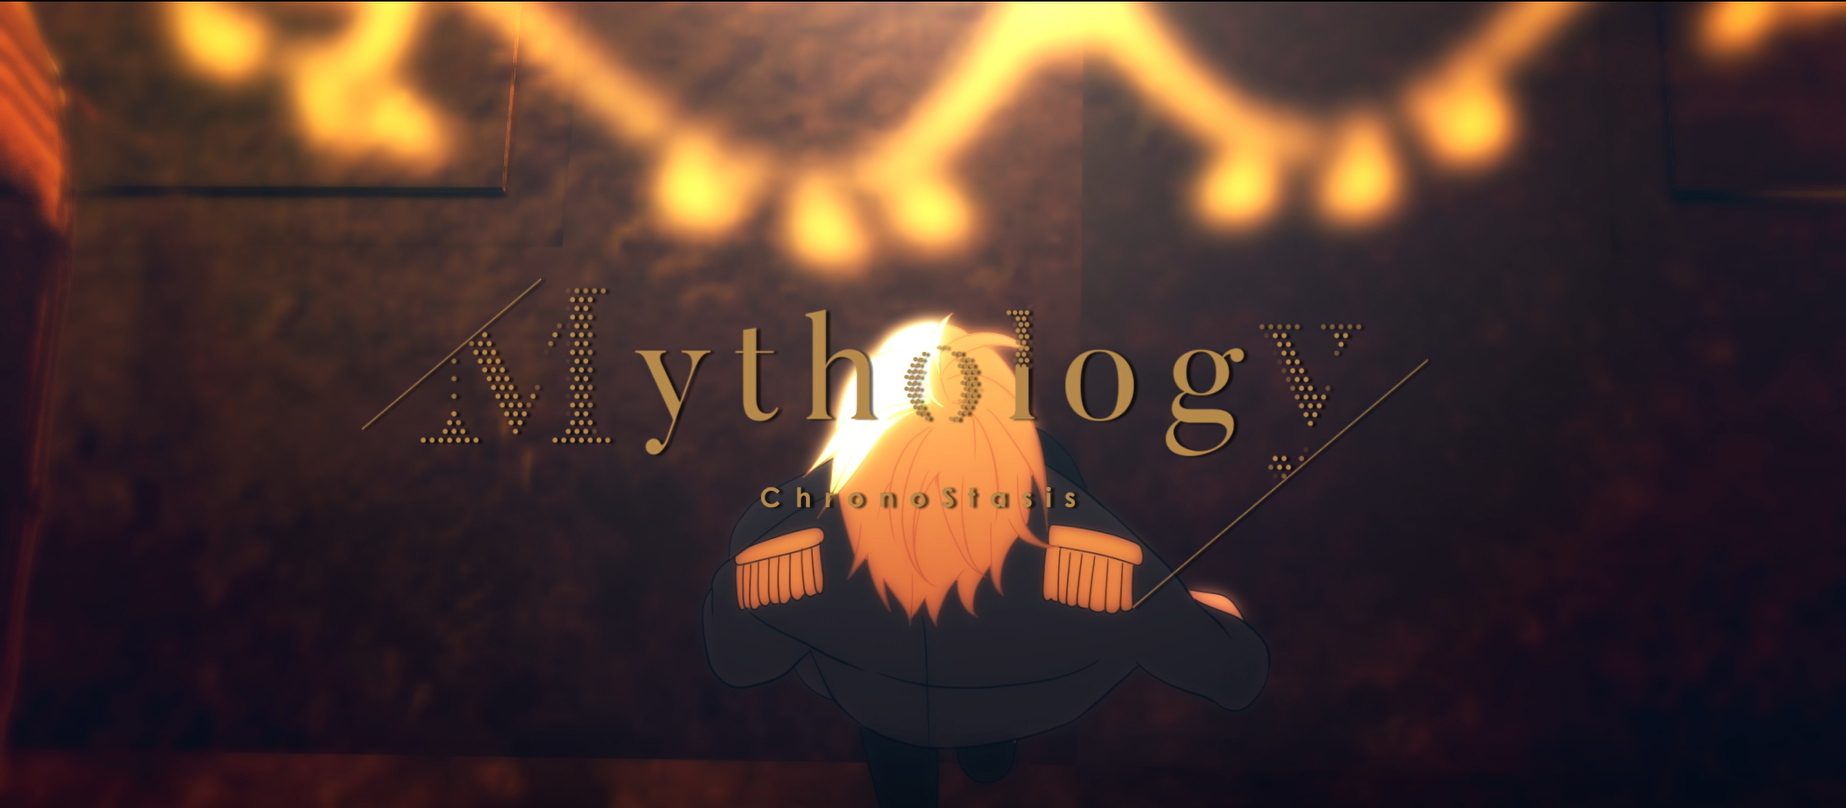 Mythologyサムネイル.png